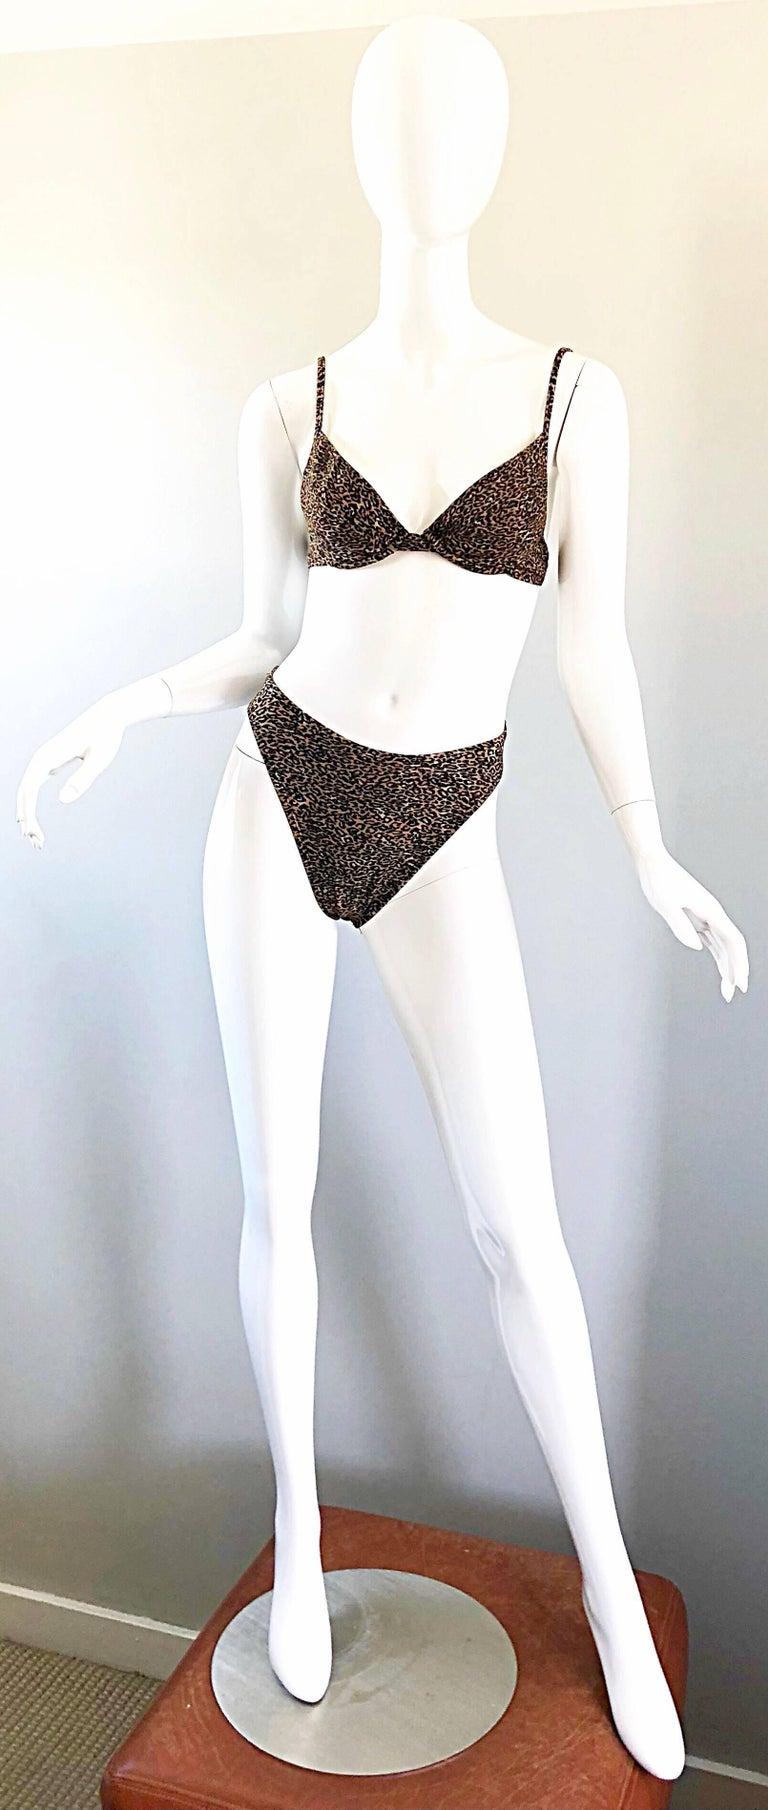 cca0b9b9a59f Vintage Oscar de la Renta 1980s Three Piece Leopard Print 80s Bikini and  Wrap For Sale